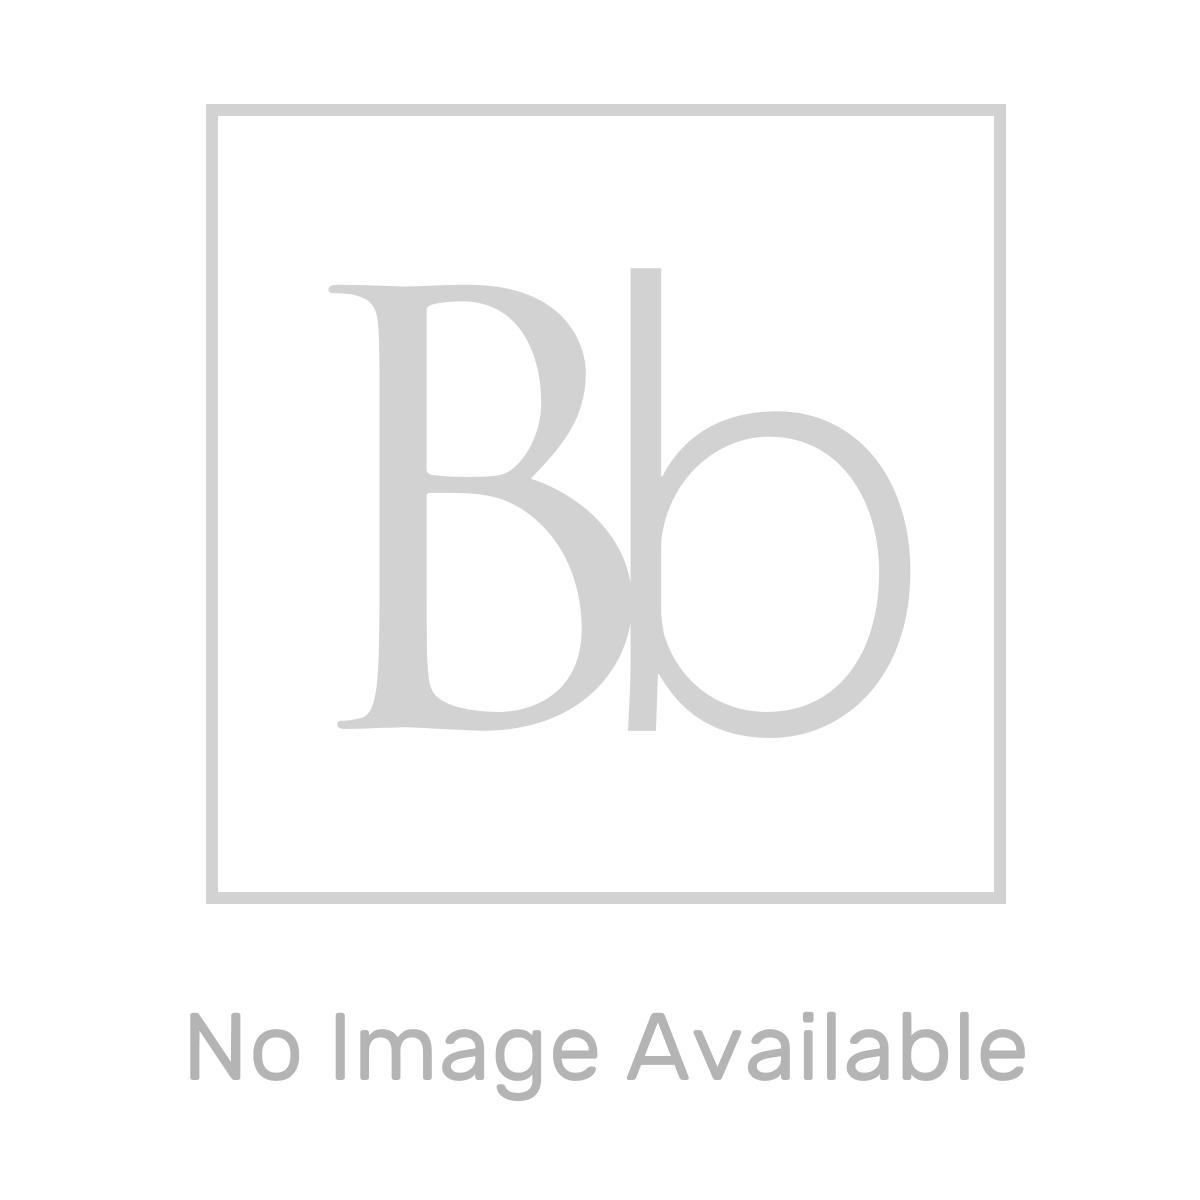 Nuie Athena Gloss Grey Mist 2 Door Floor Standing Vanity Unit with 50mm Profile Basin 500mm Line Drawing